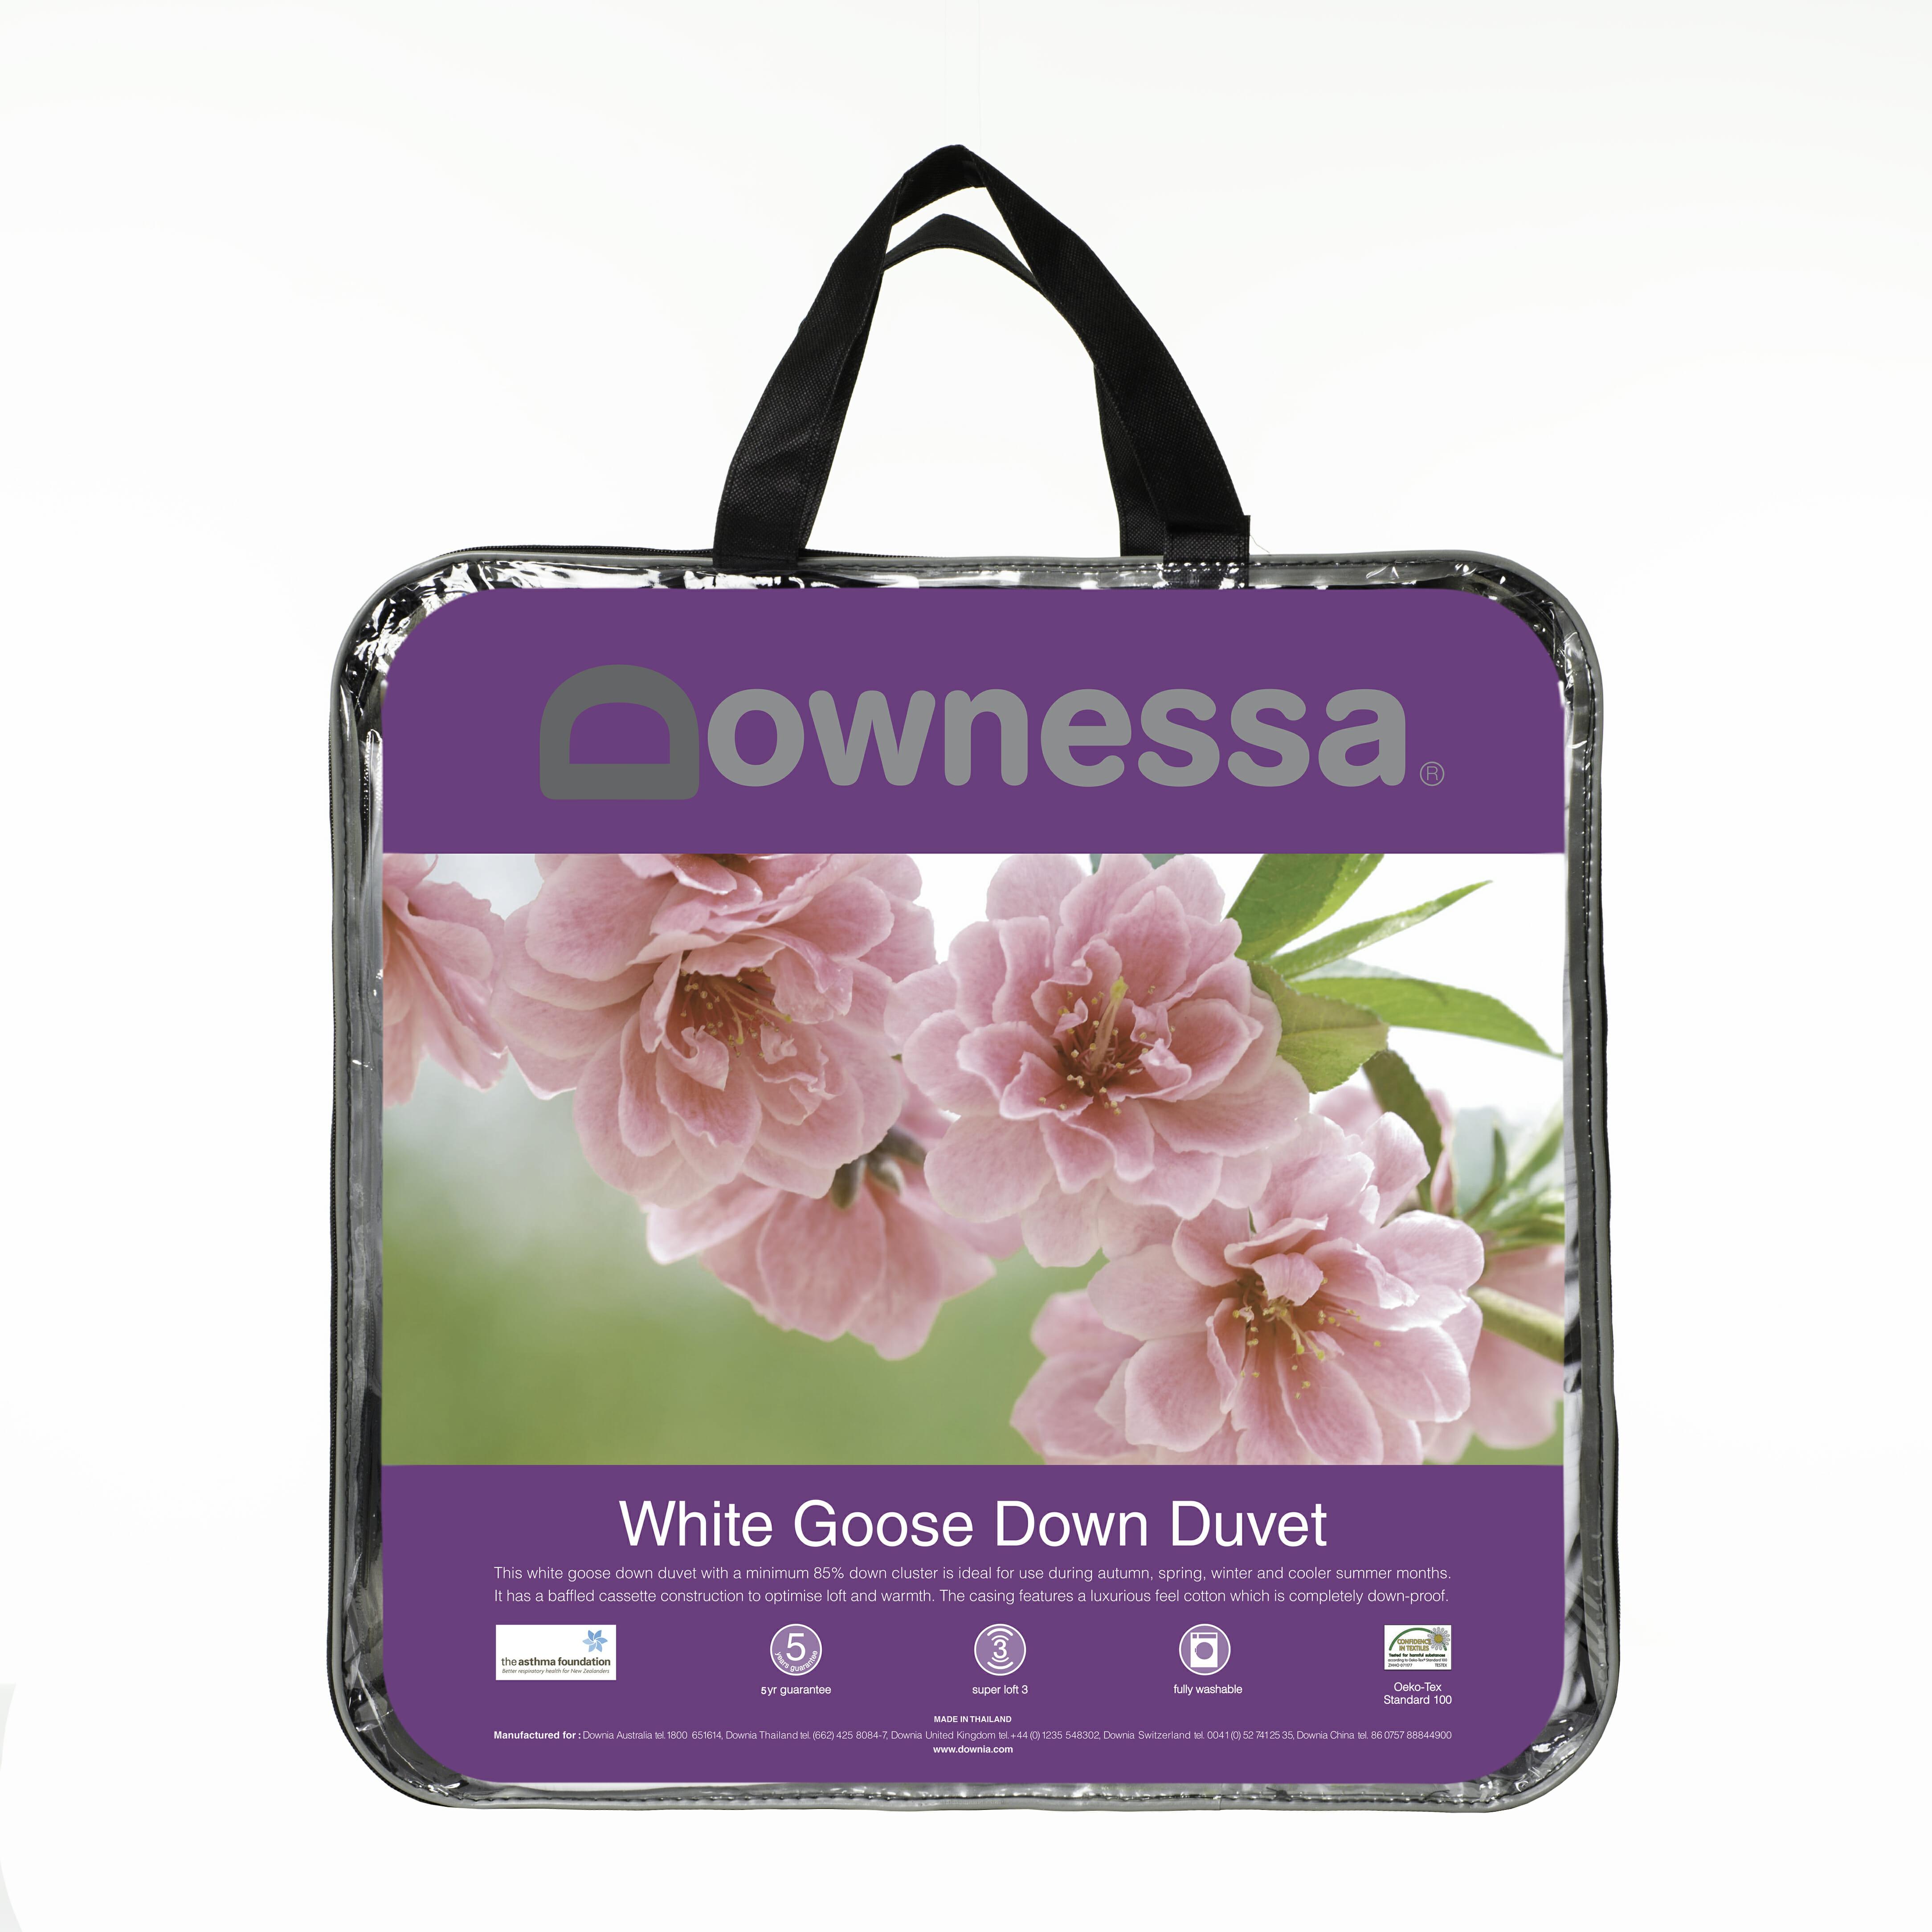 Downessa 85 White Goose Down Duvet Downia